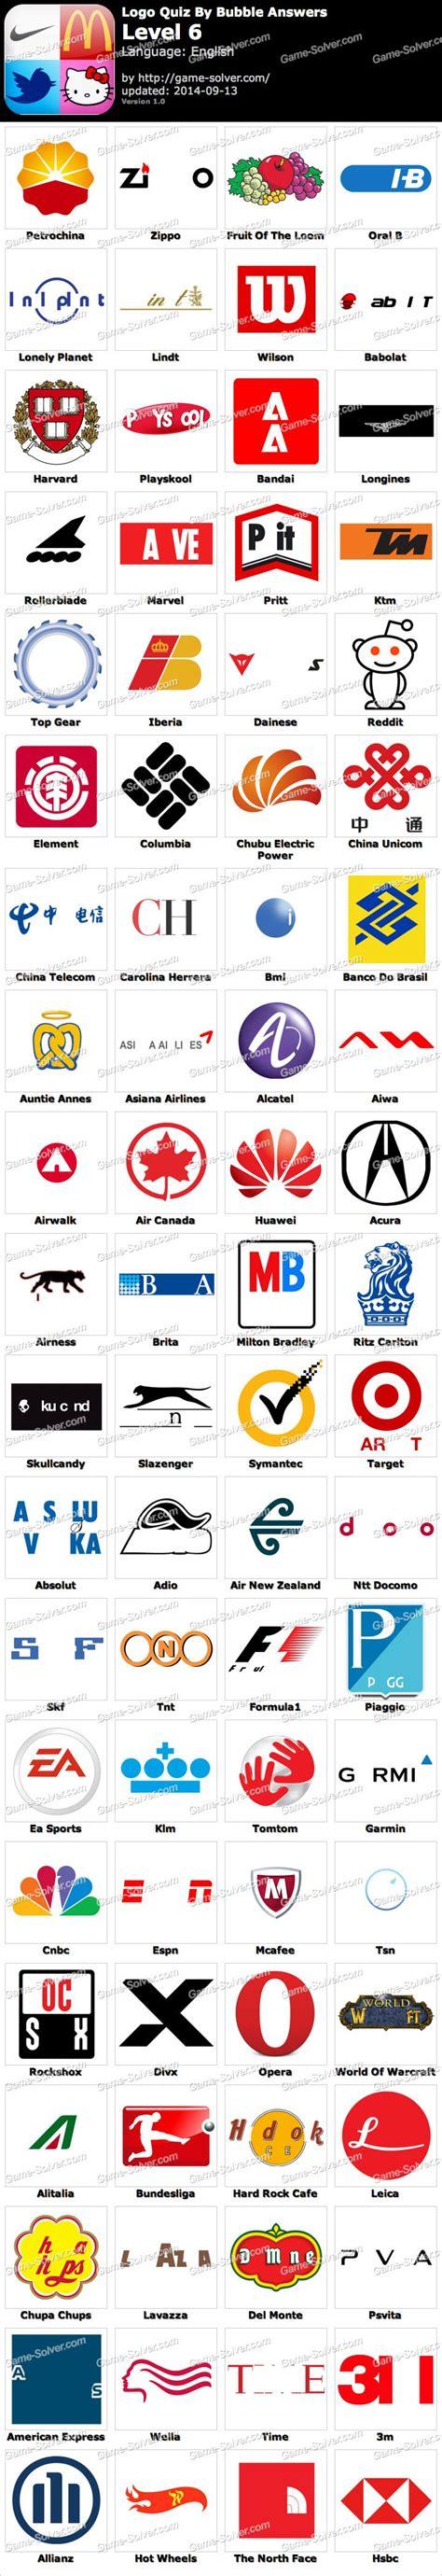 logo quiz ultimate media answers game solver sports brand logos quiz www imgkid com the image kid